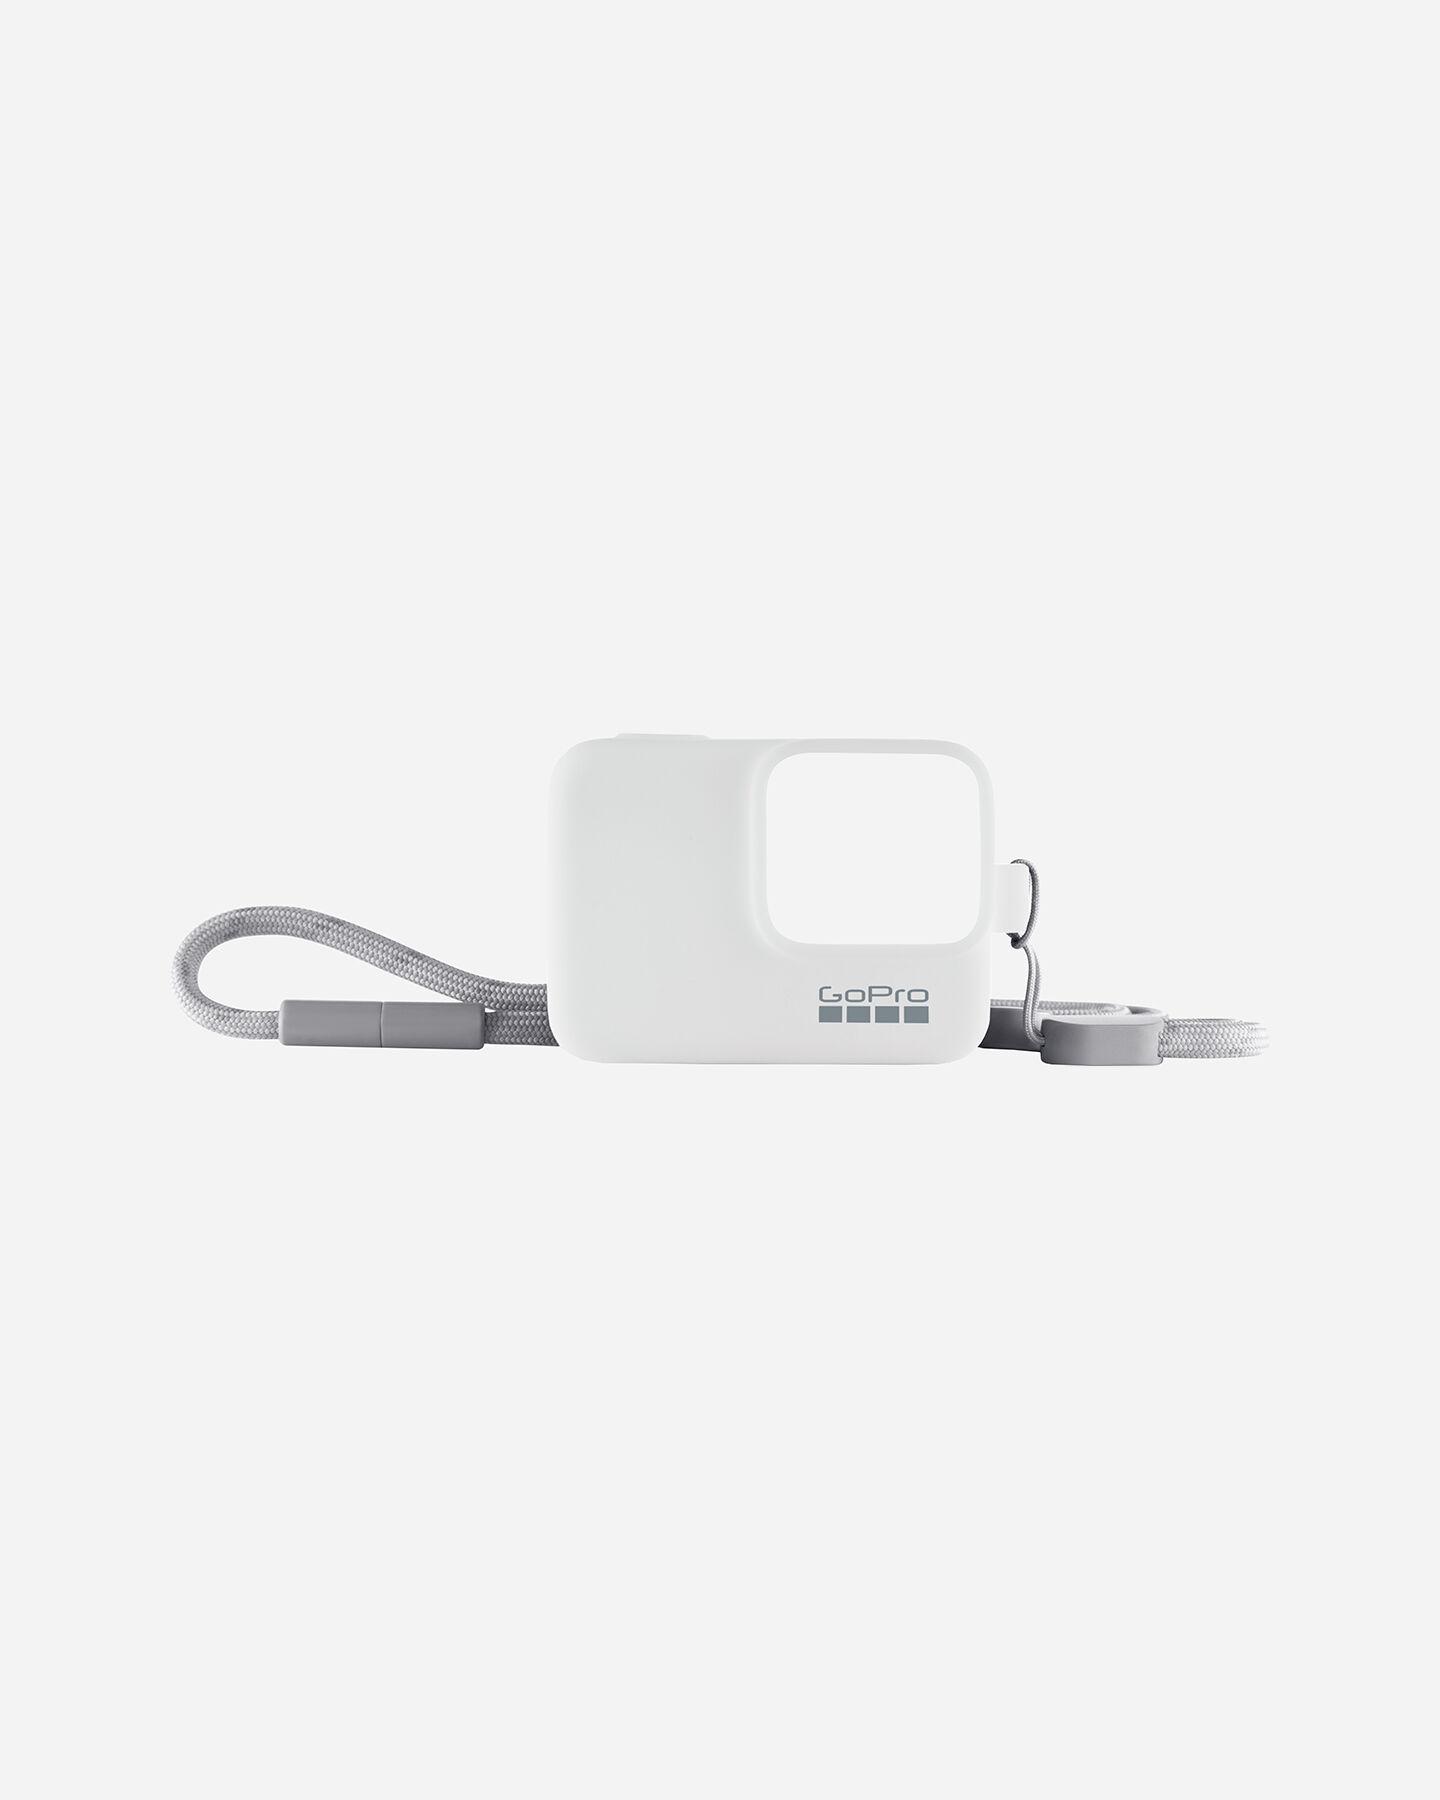 Videocamera GOPRO CASE + LANYARD S4062709 1 UNI scatto 2